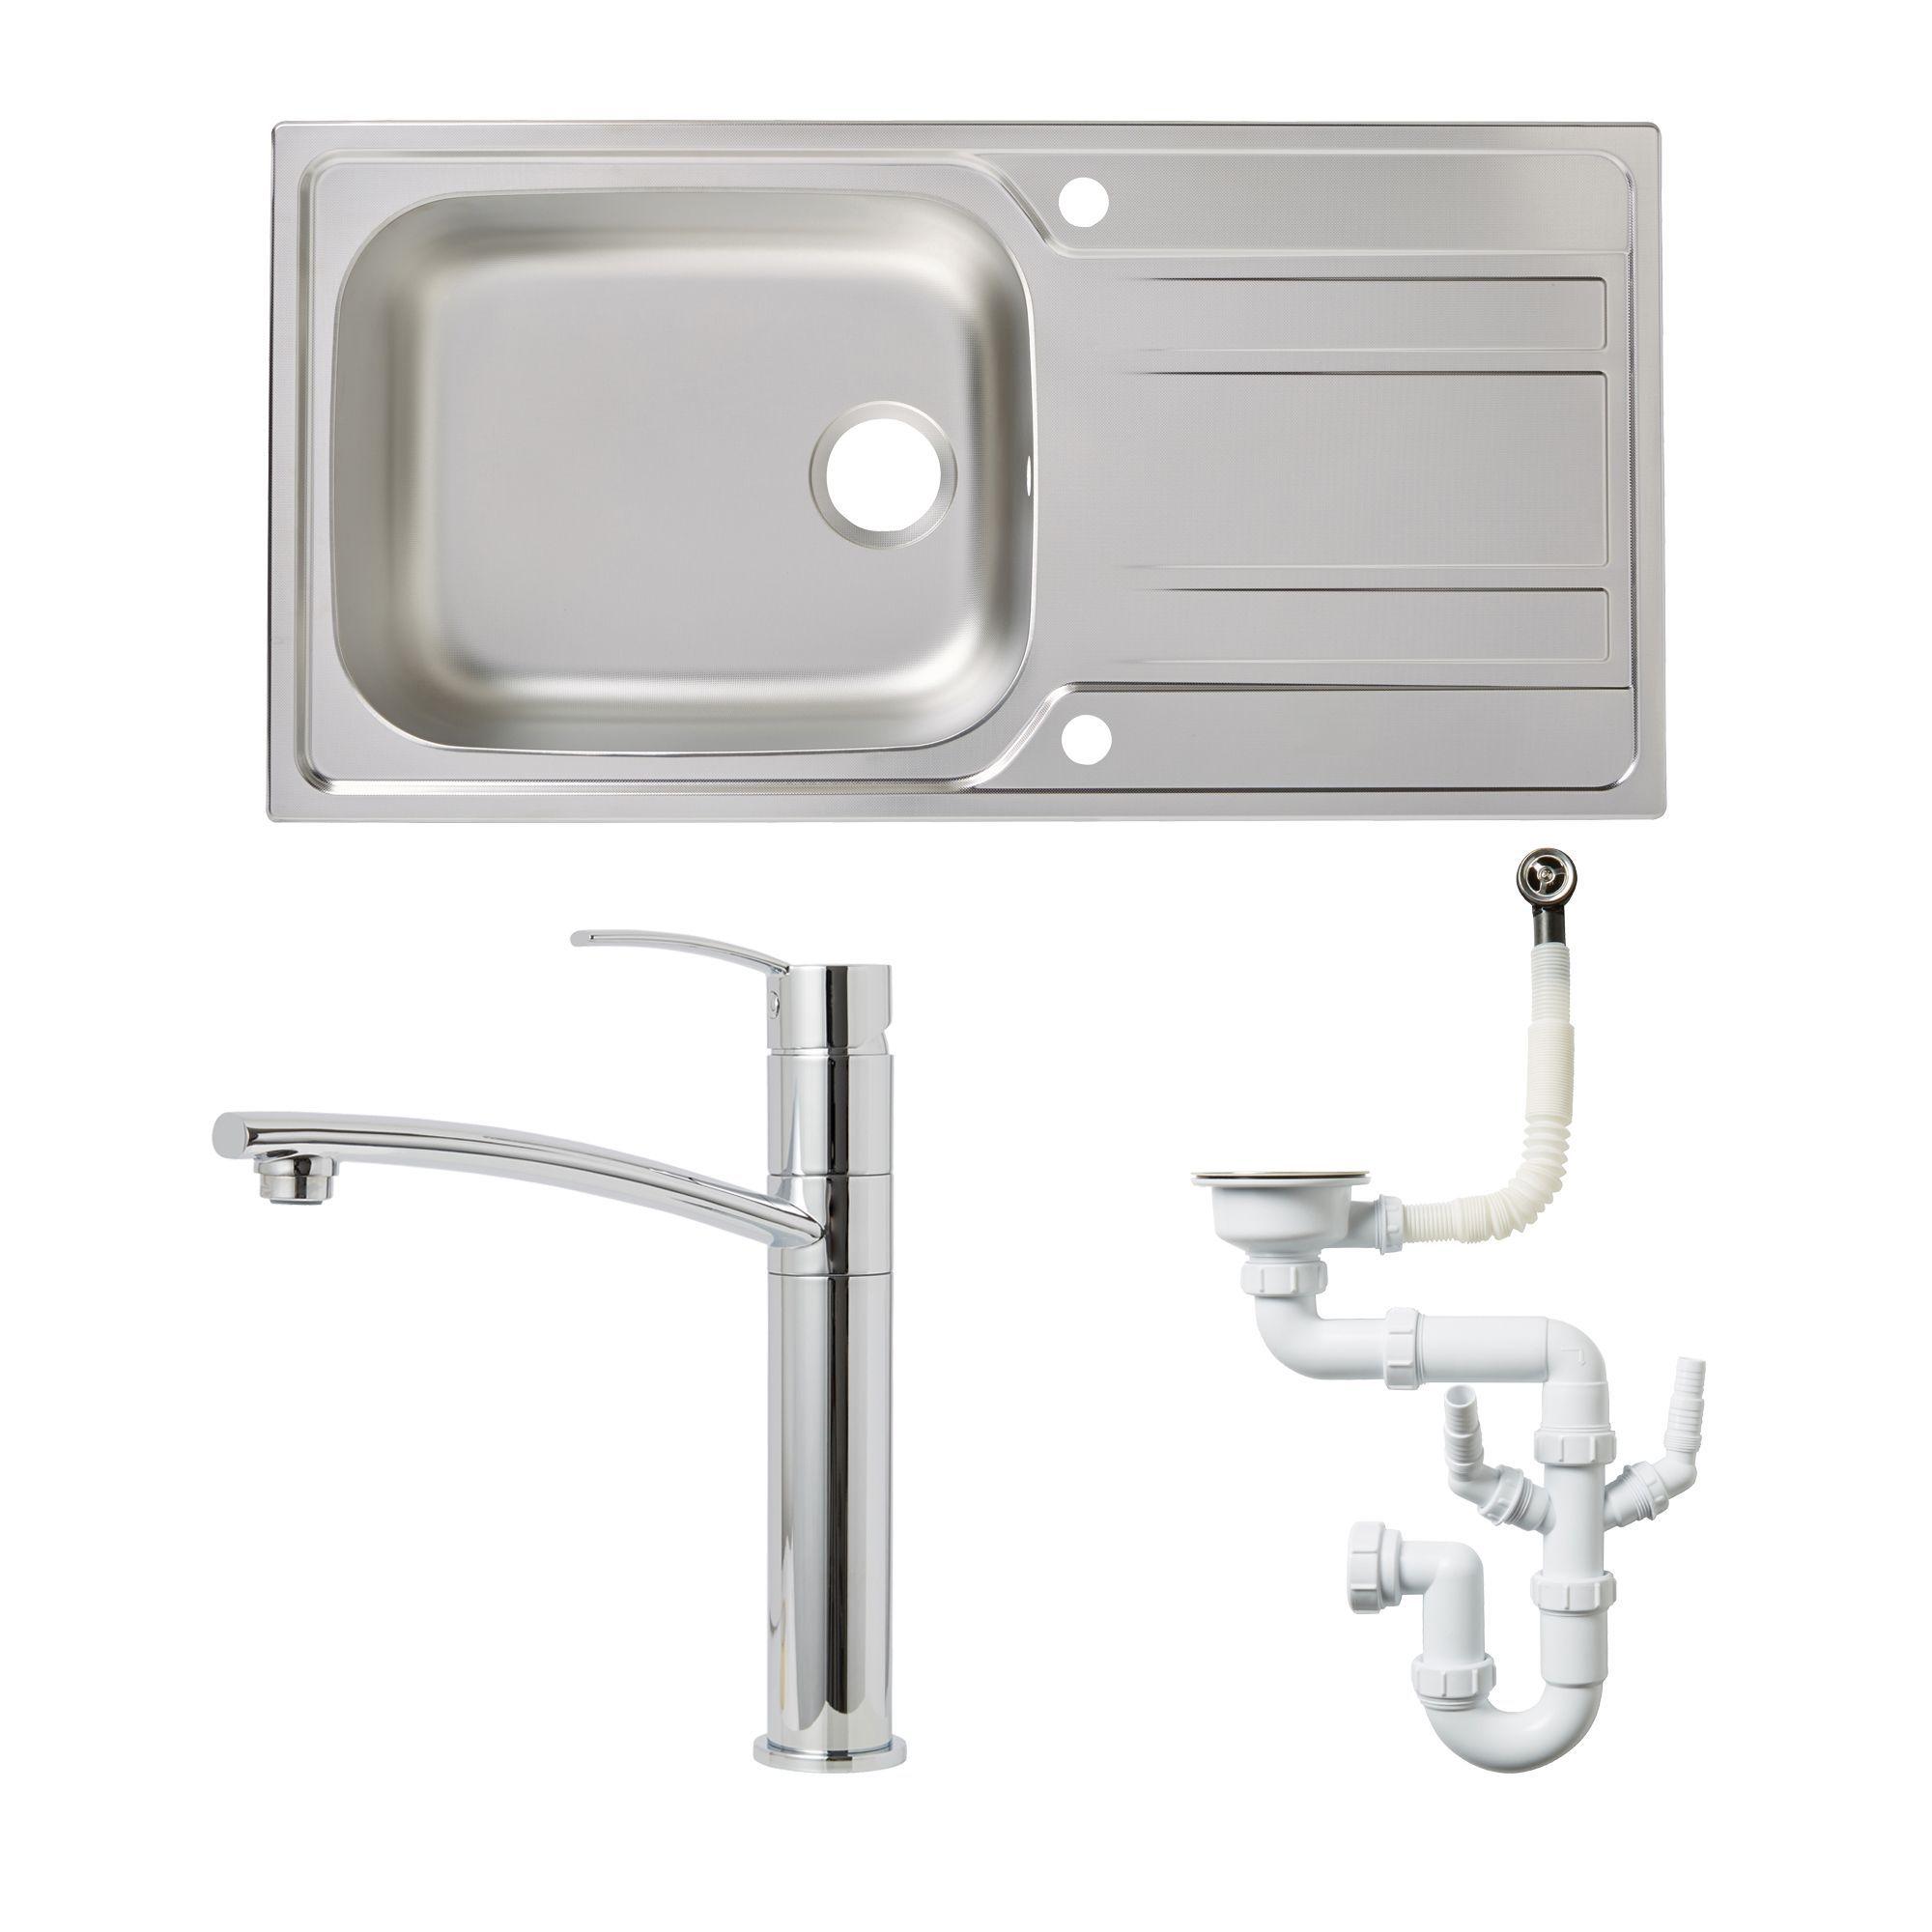 Cooke & Lewis 1 Bowl Stainless Steel Sink, Tap & Waste Kit